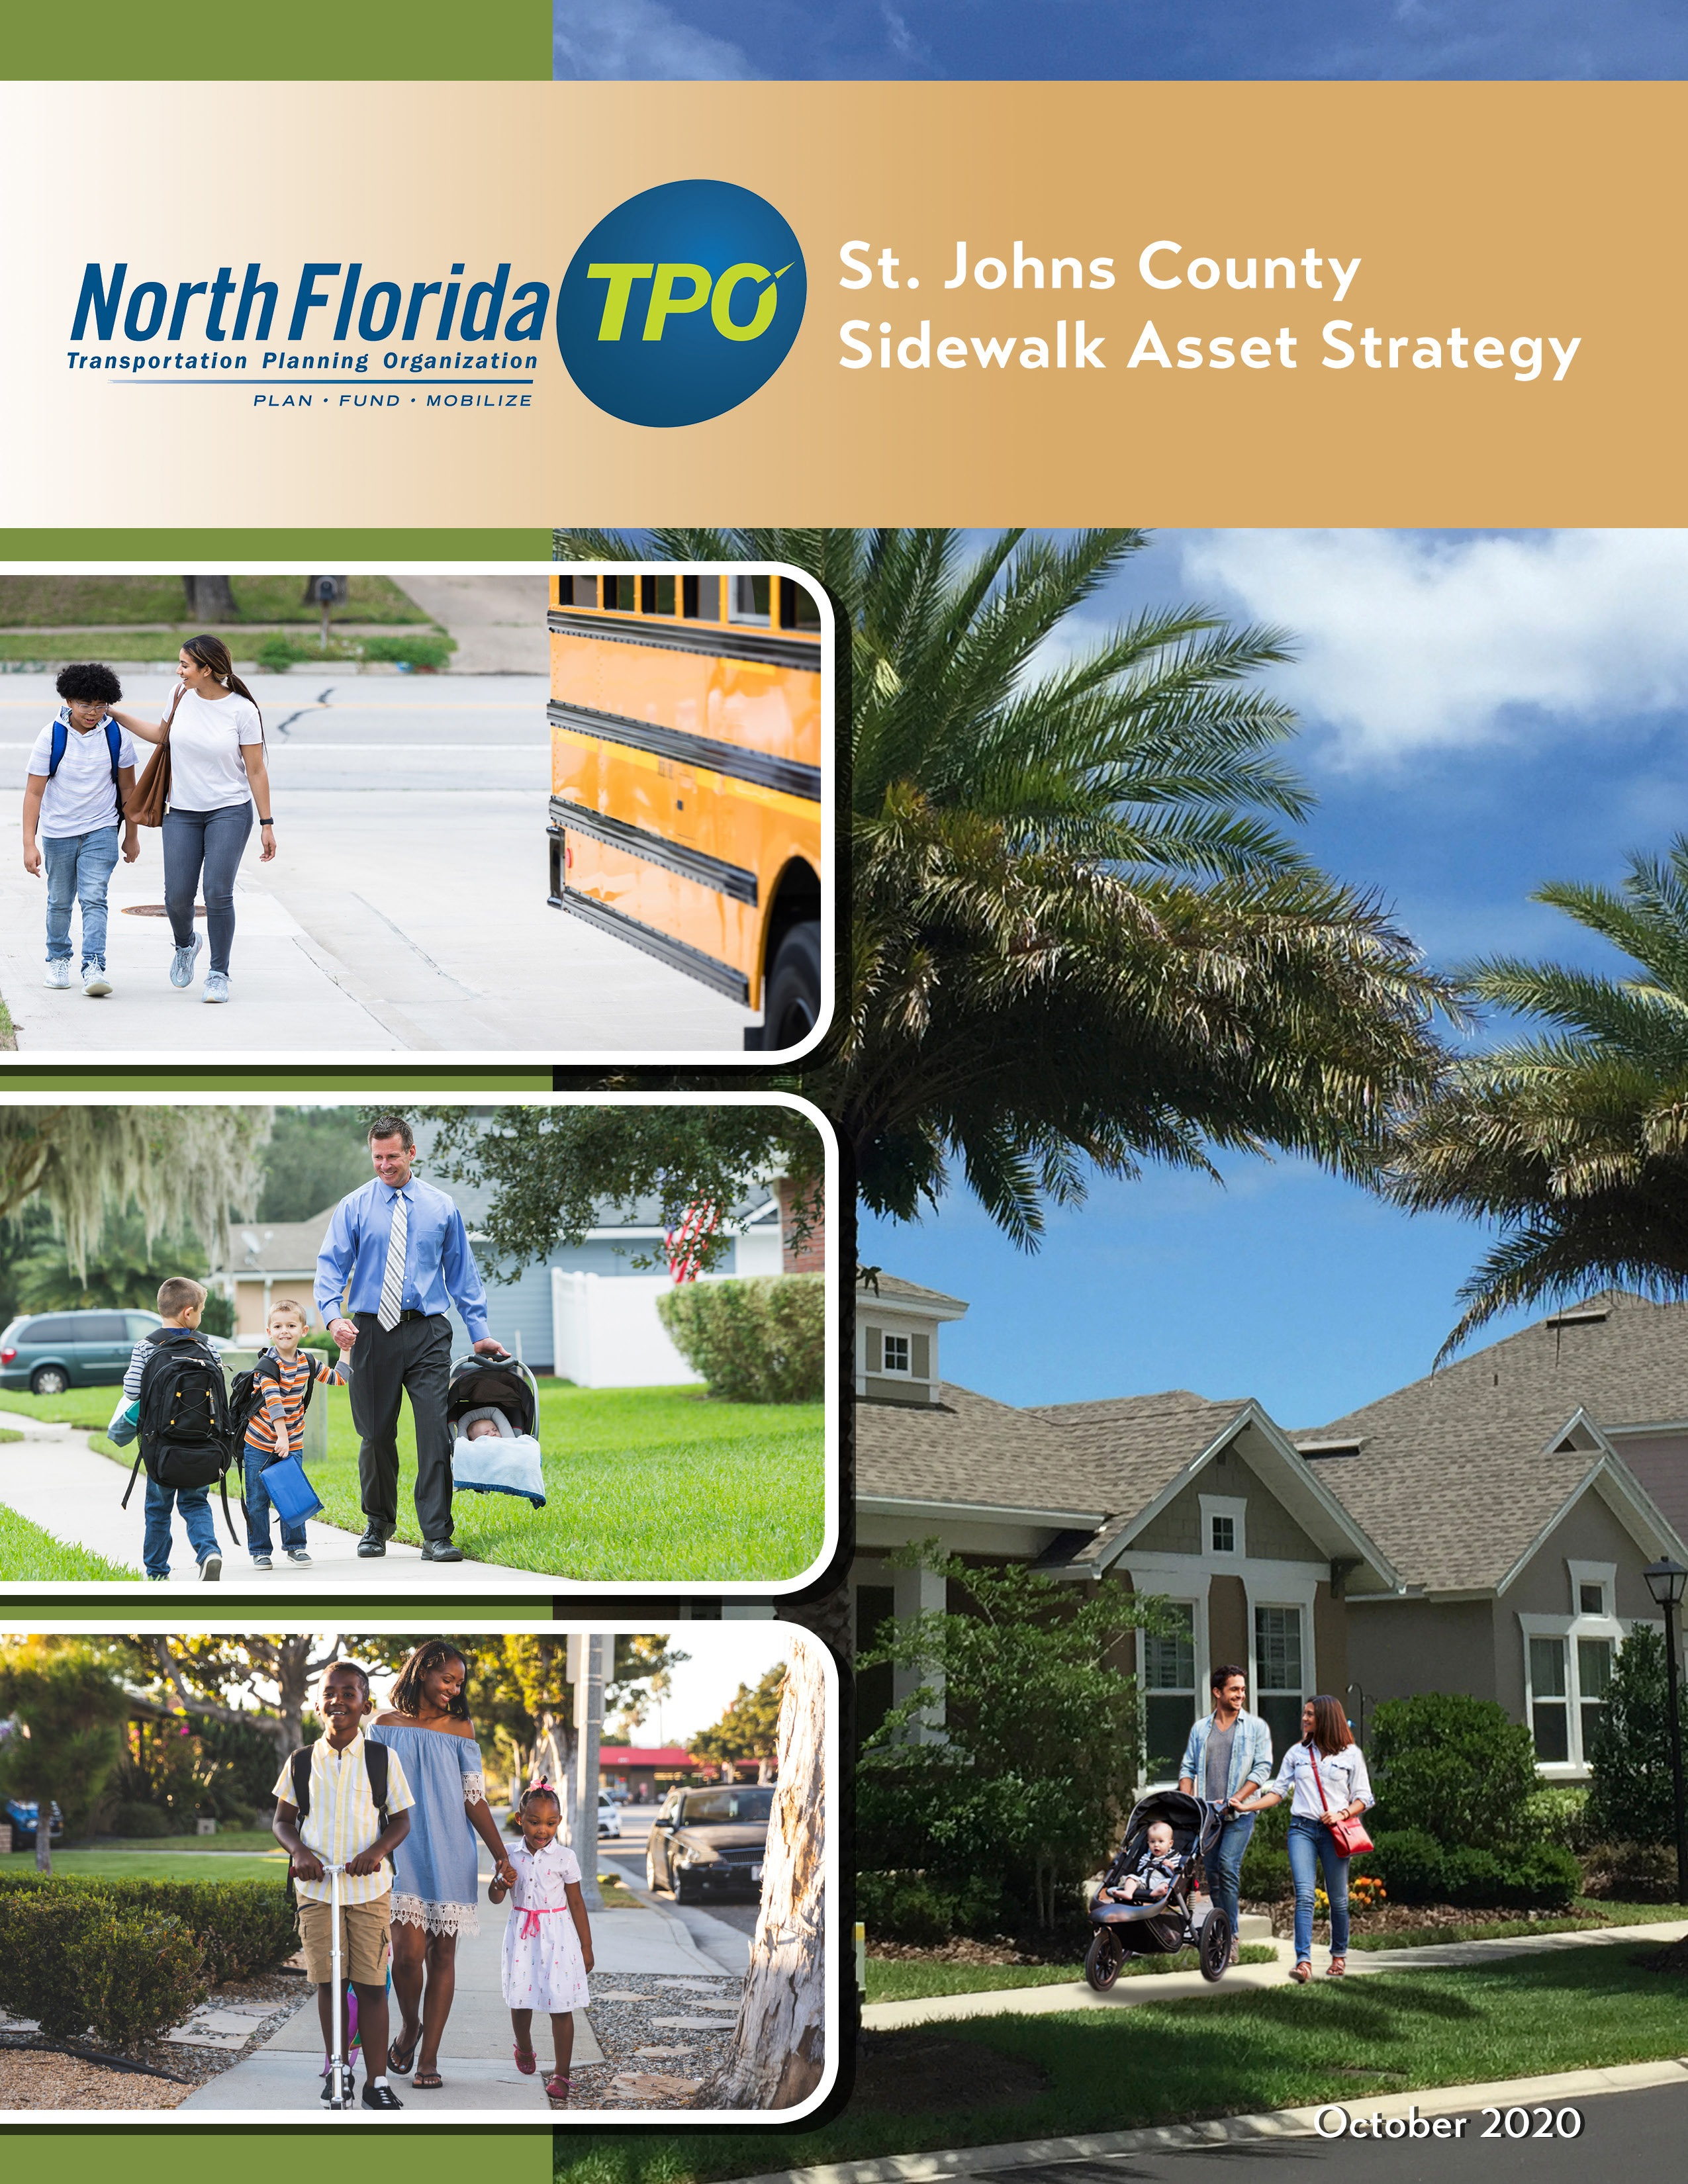 SJ Sidewalk Asset Strategy Study 2 12 2 2020 cover